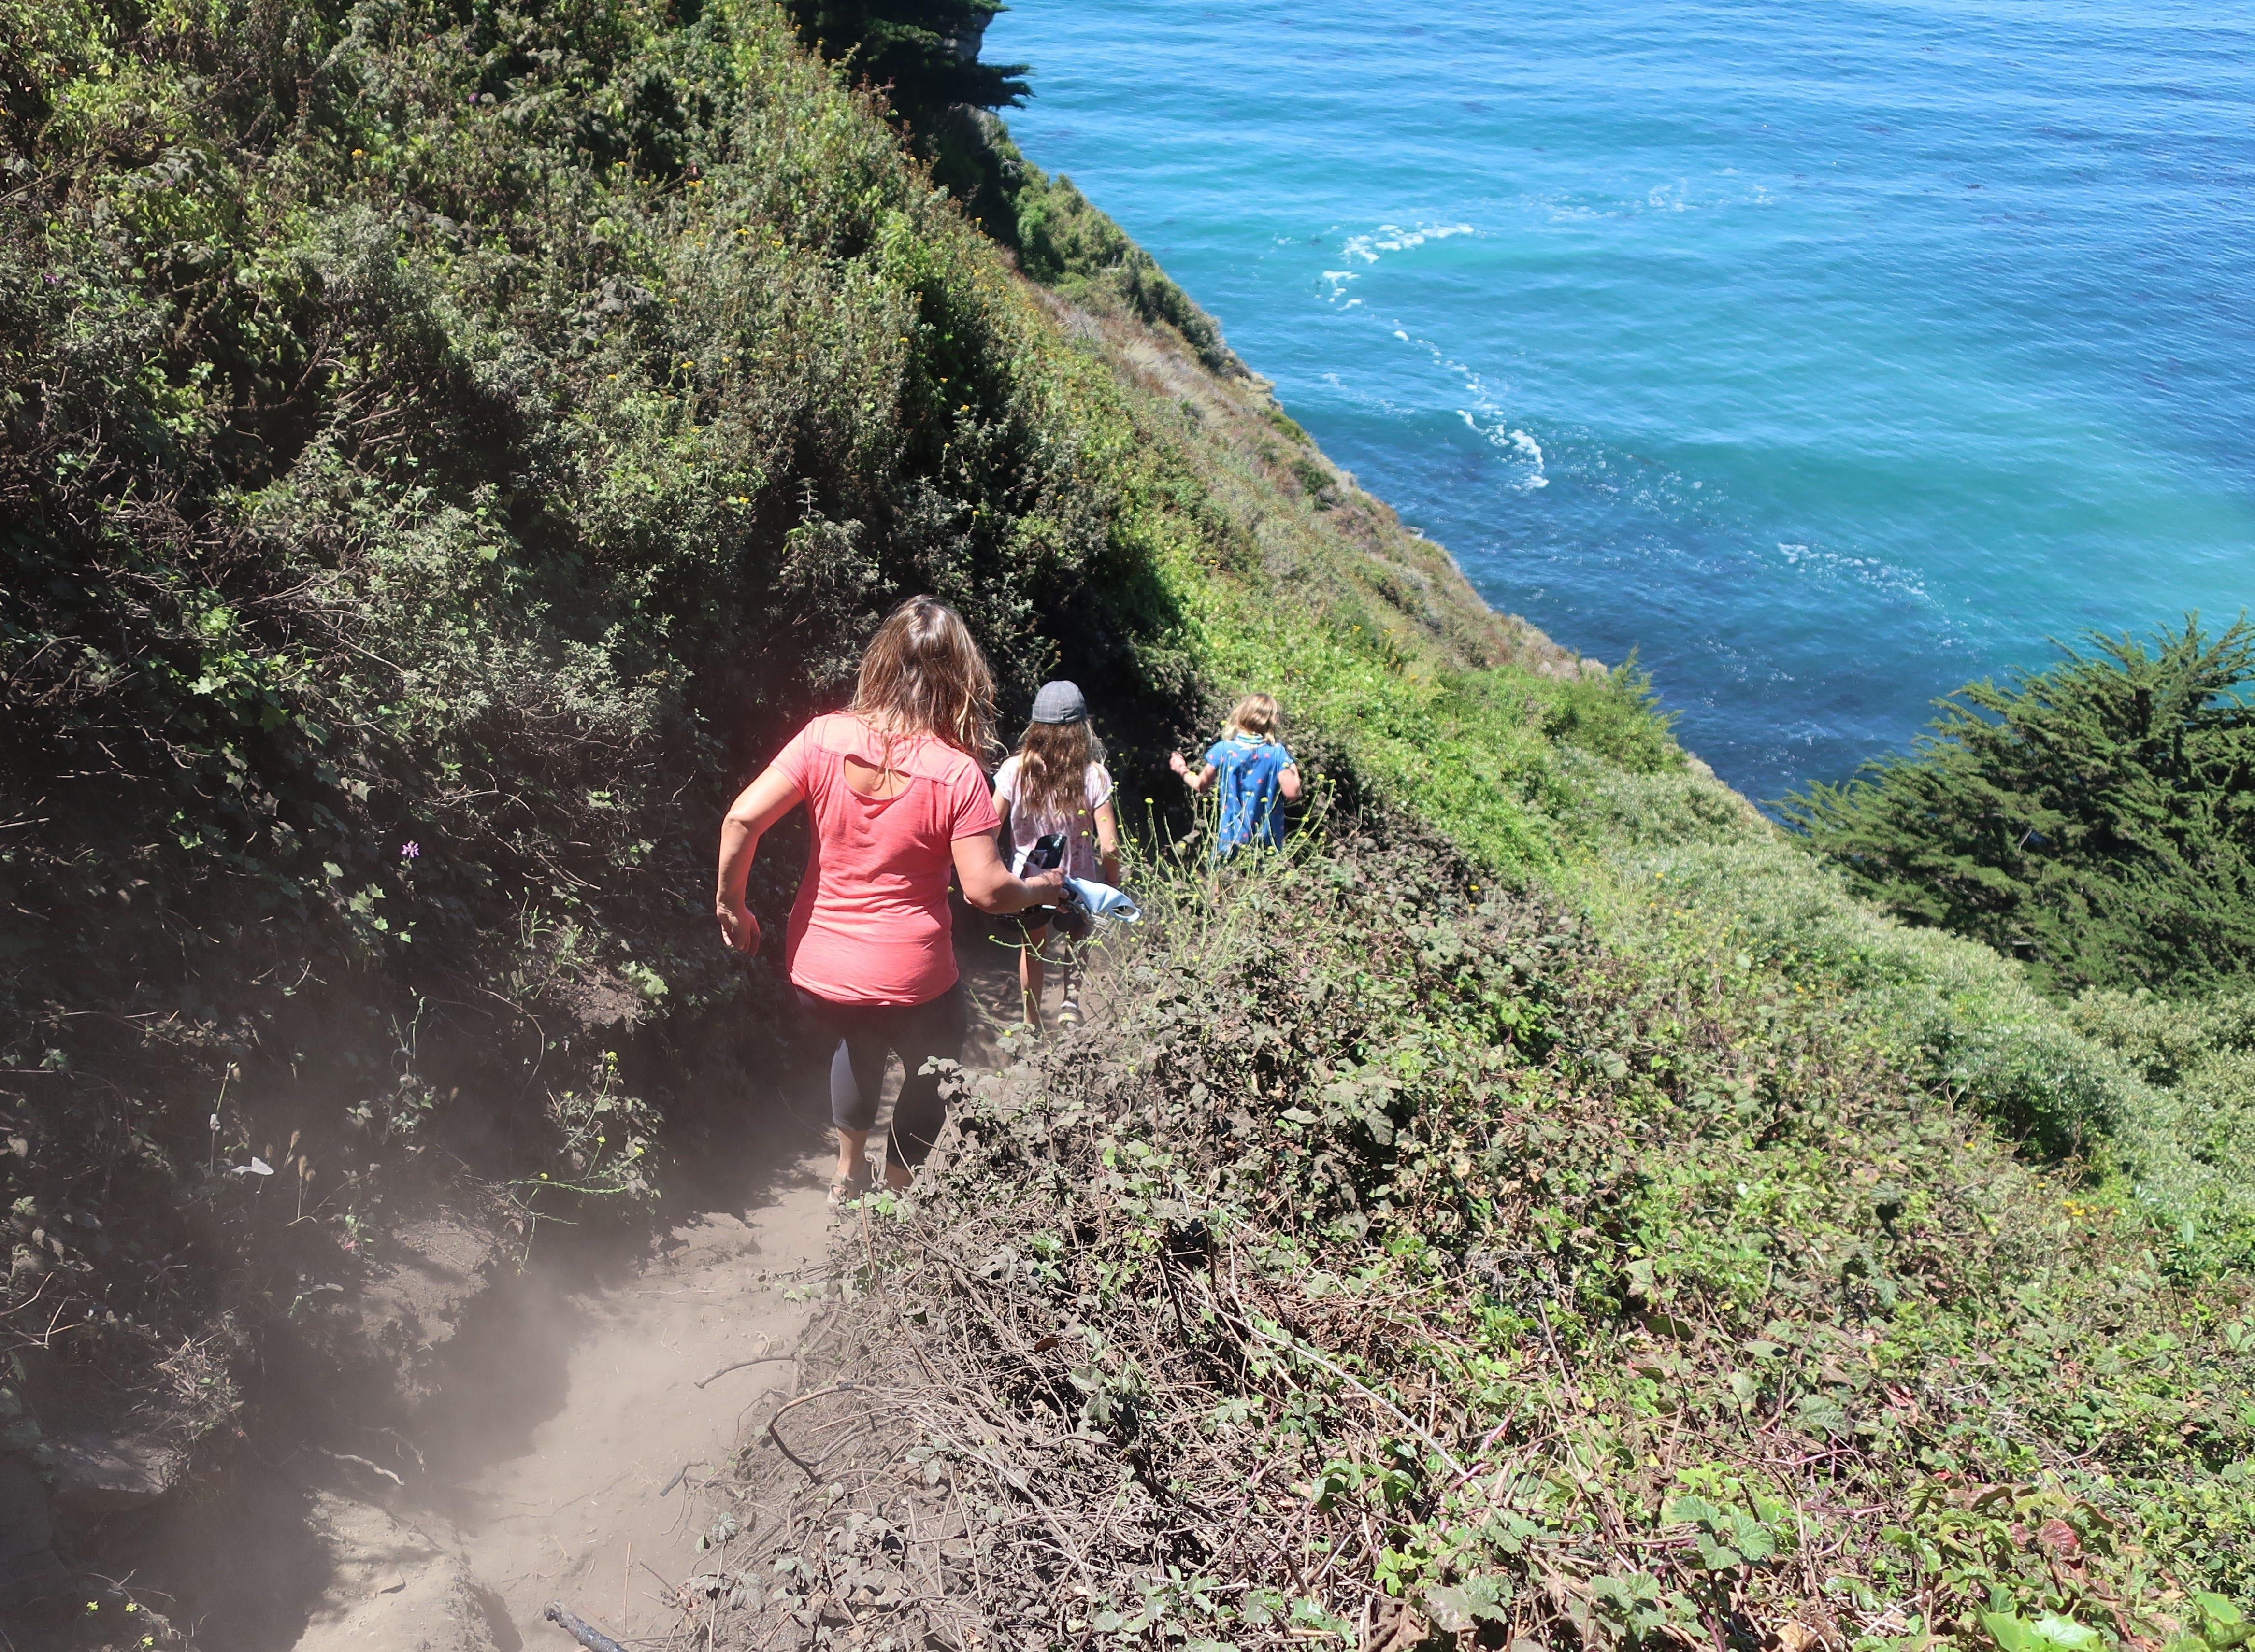 California Highway 1 Best Views Hikes Things To Do Near San Luis Obispo